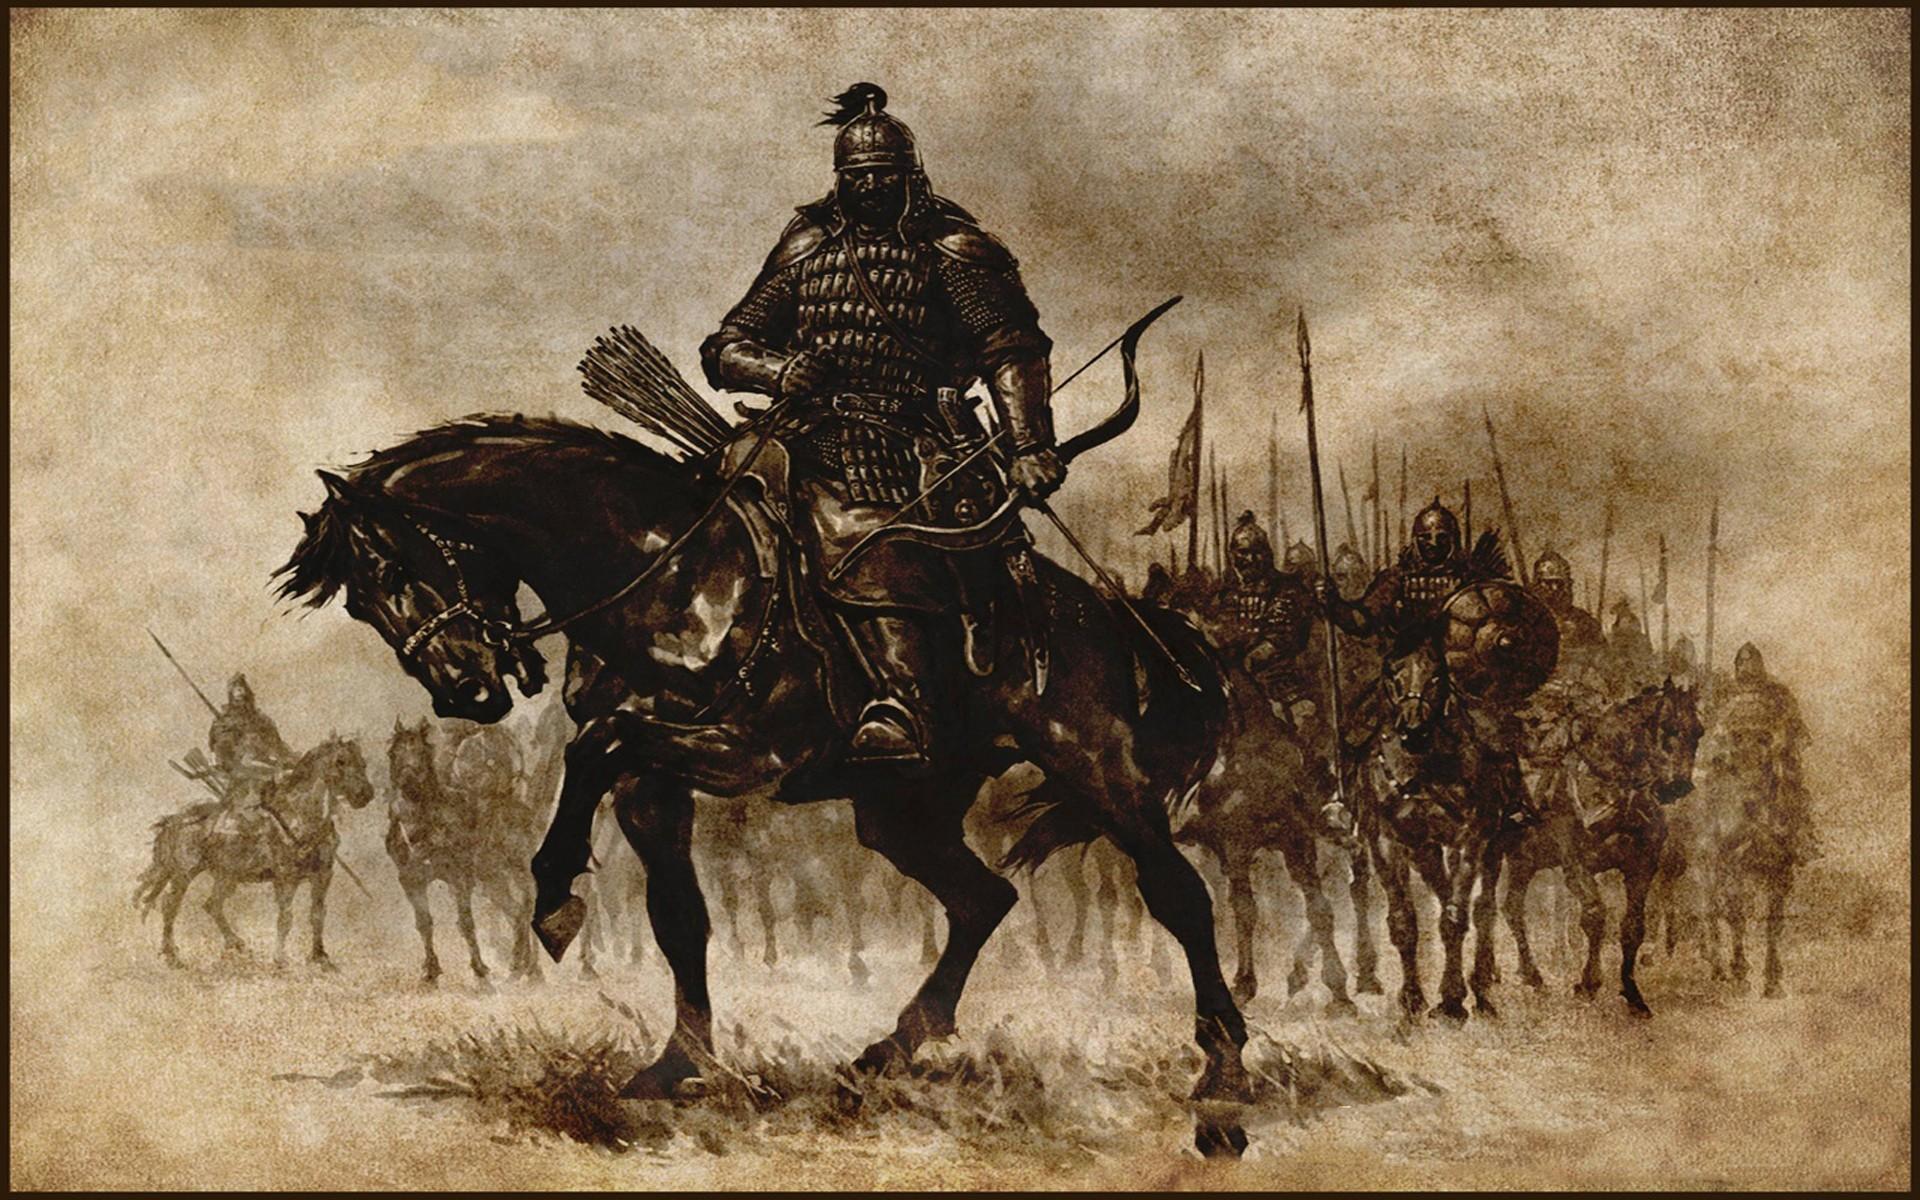 Wallpaper Warrior Mount And Blade Archer Video Games Horse